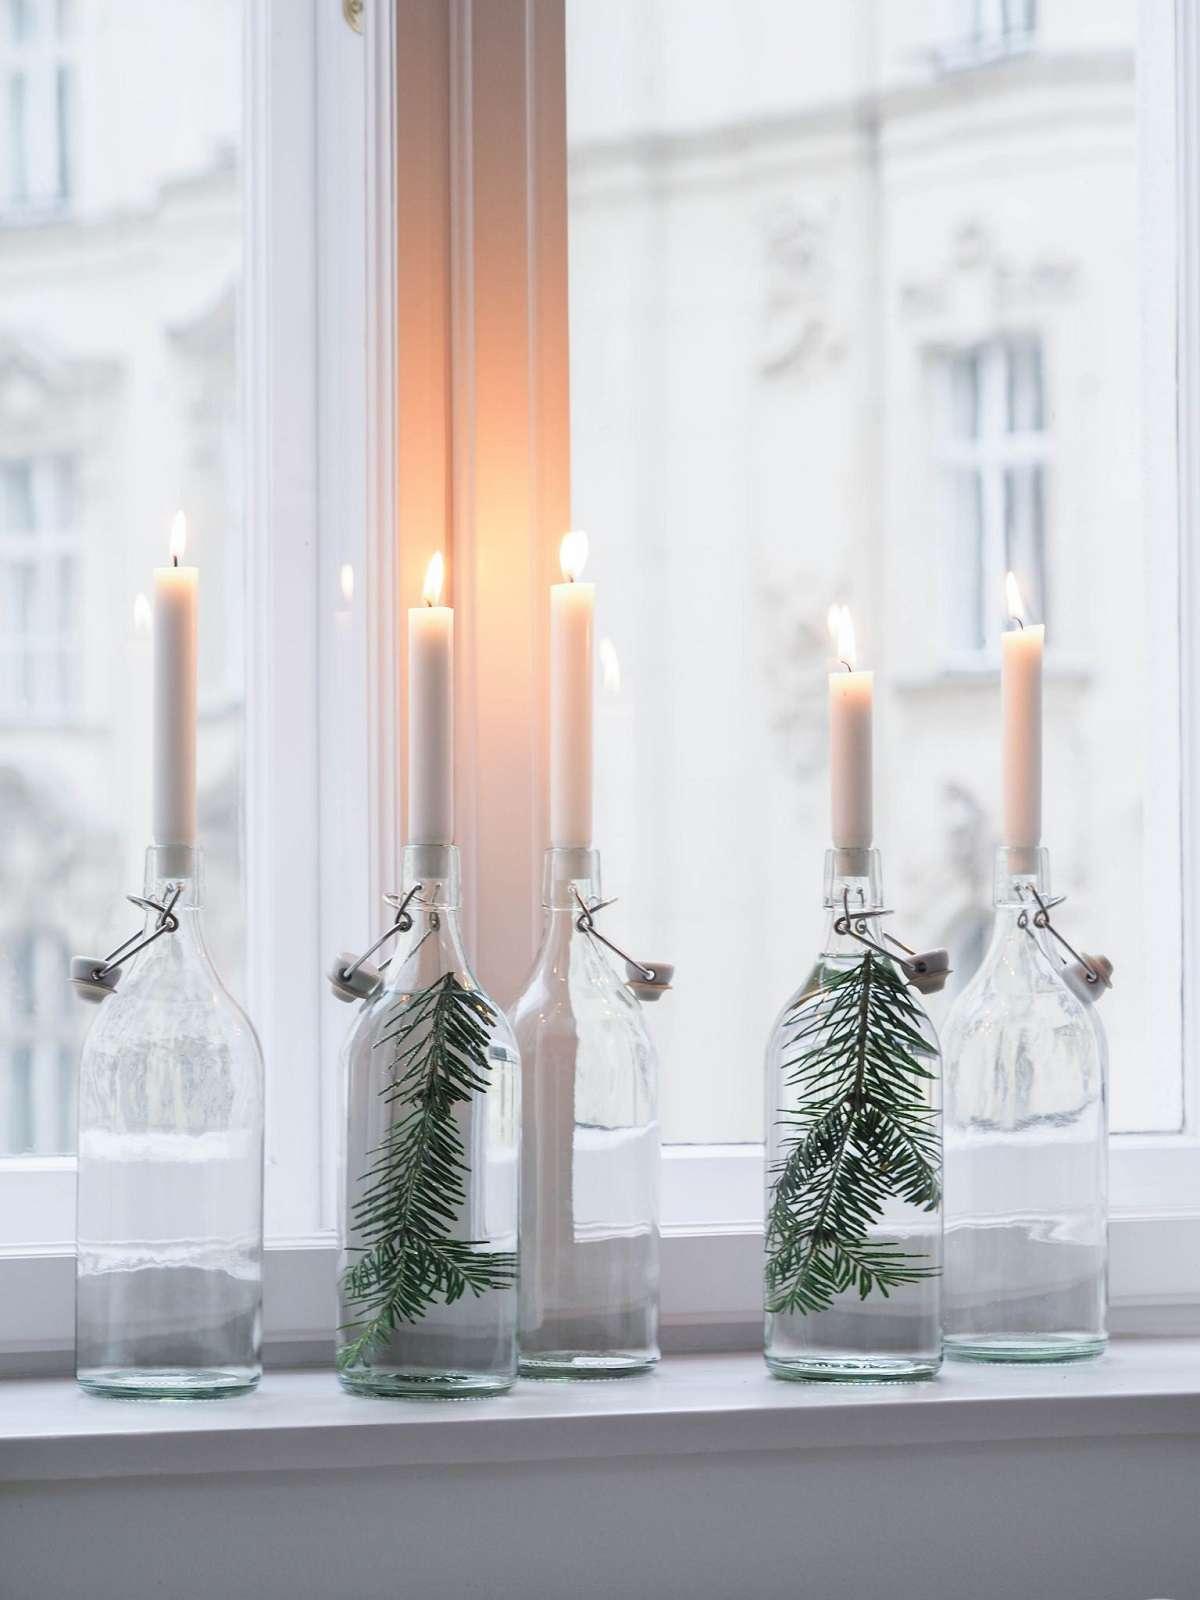 8 Manualidades navideñas de estilo nórdico 5